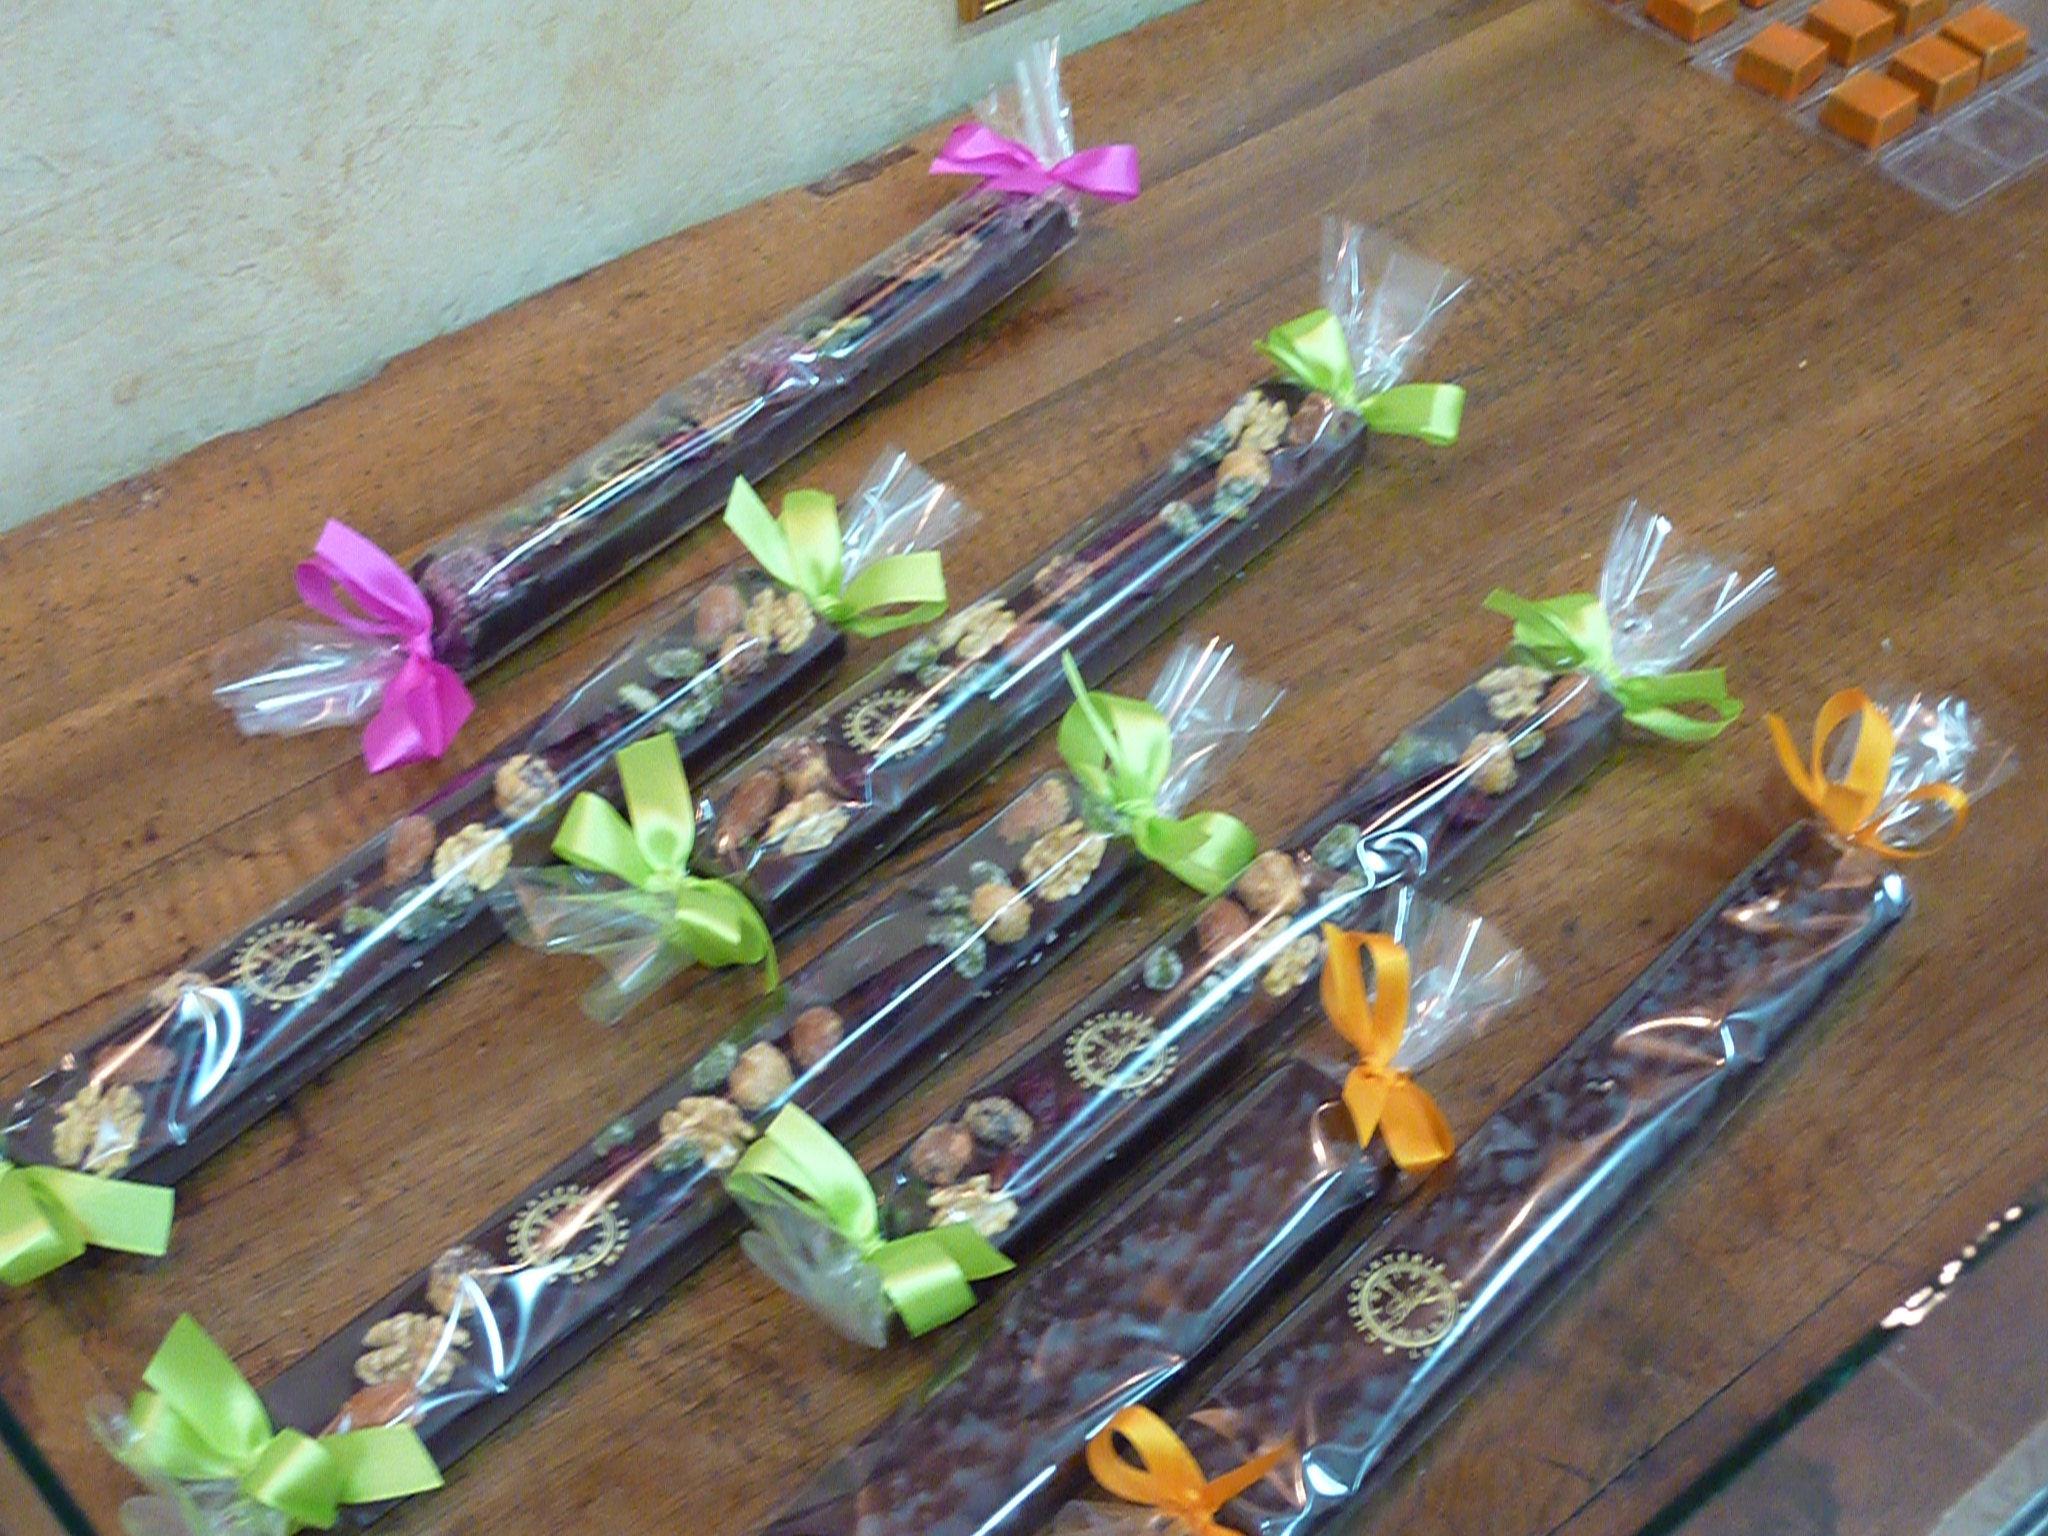 Chocolate Barrettes at Mococha